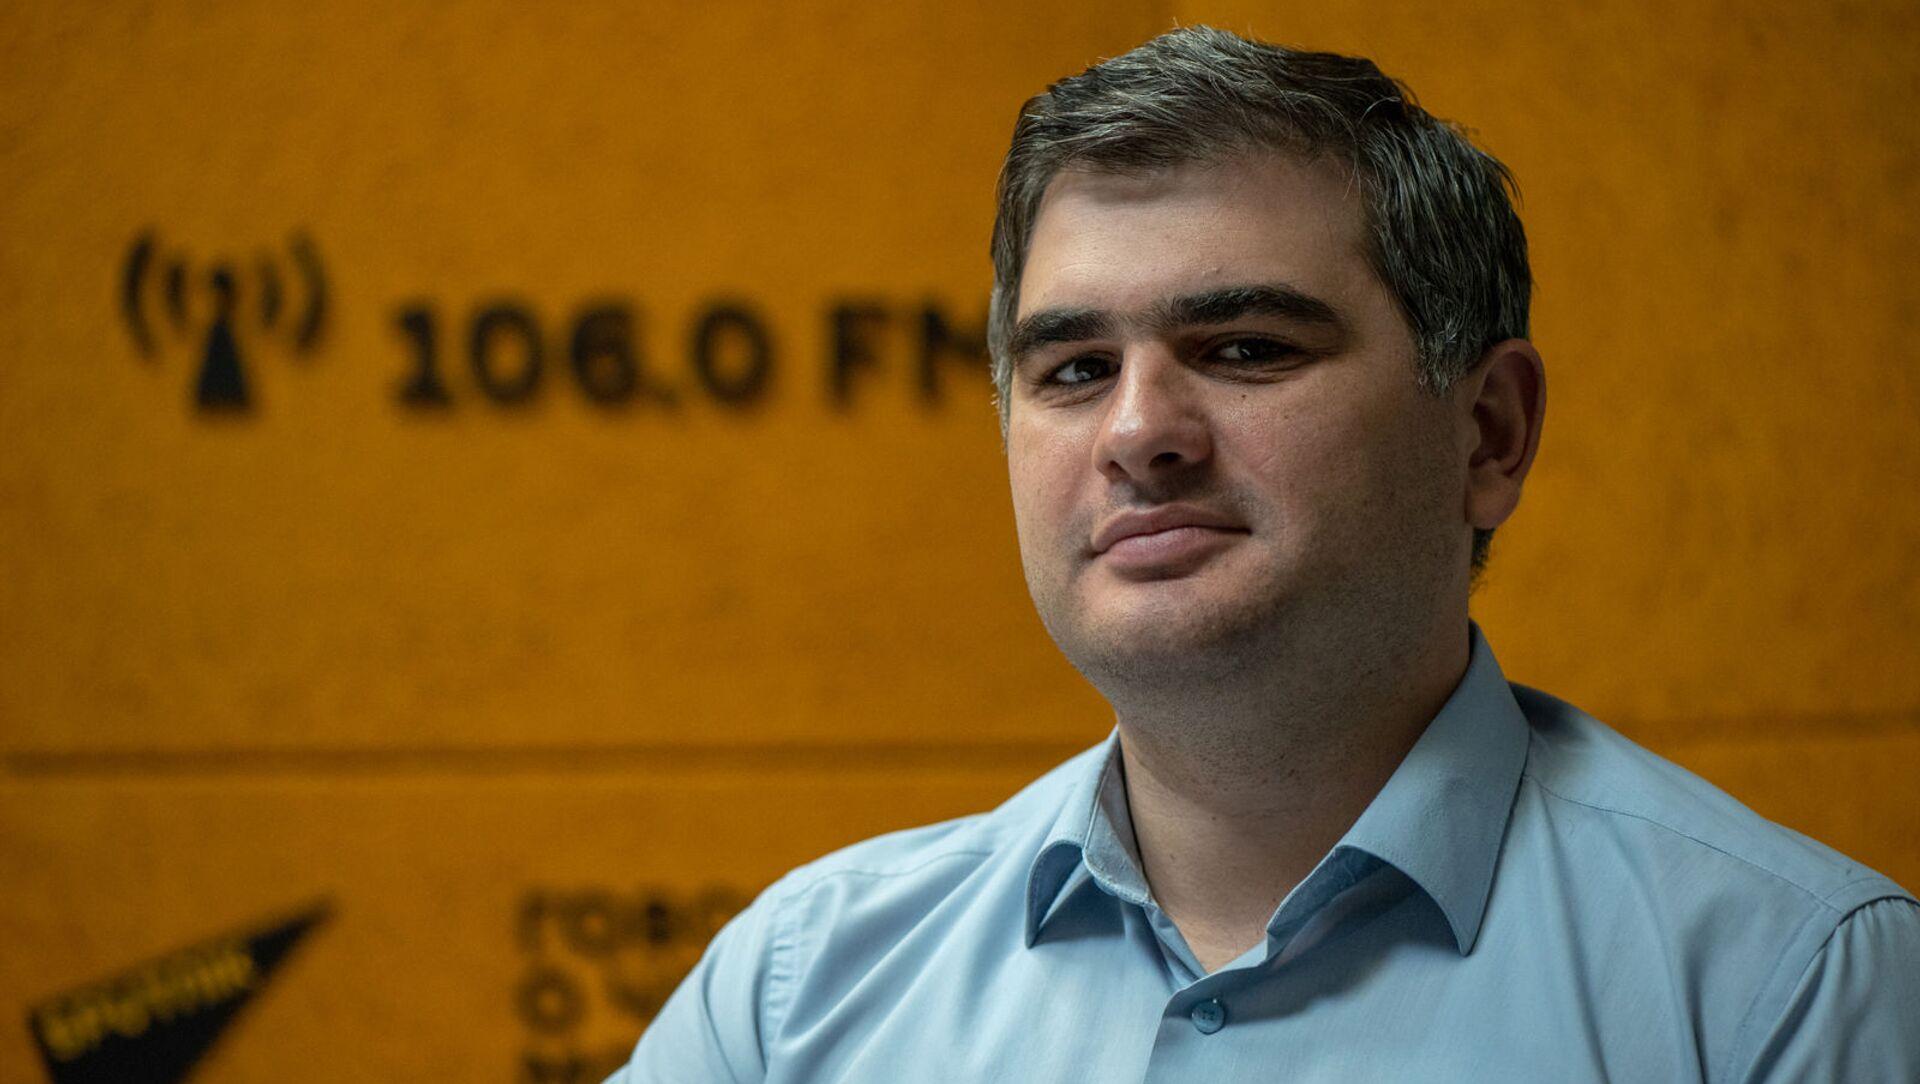 Экономист Сурен Парсян в гостях радио Sputnik - Sputnik Արմենիա, 1920, 30.08.2021